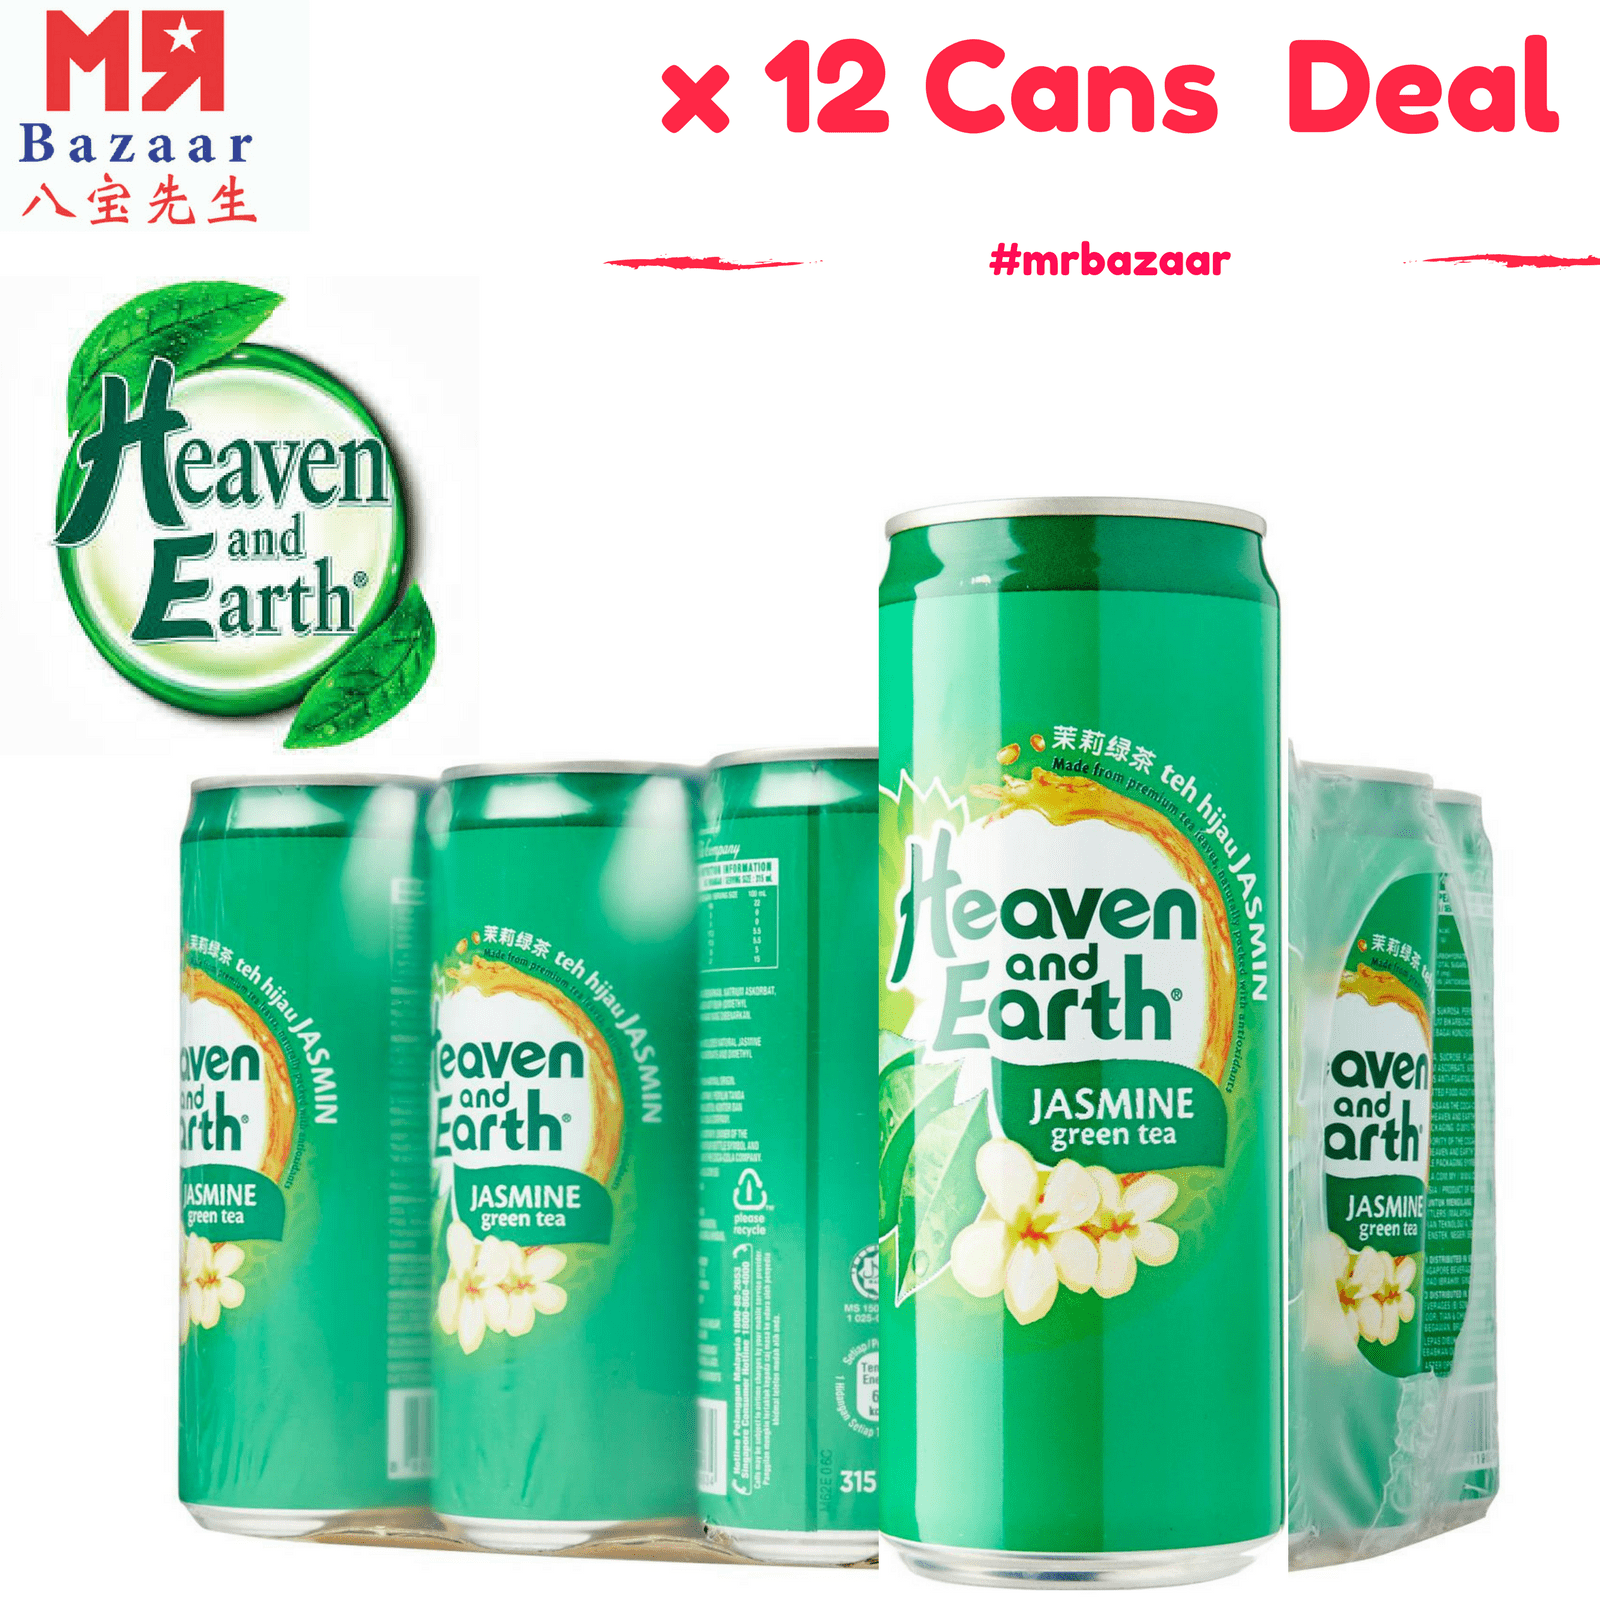 Heaven & Earth Jasmine Green Tea (300ml) x 12 Cans